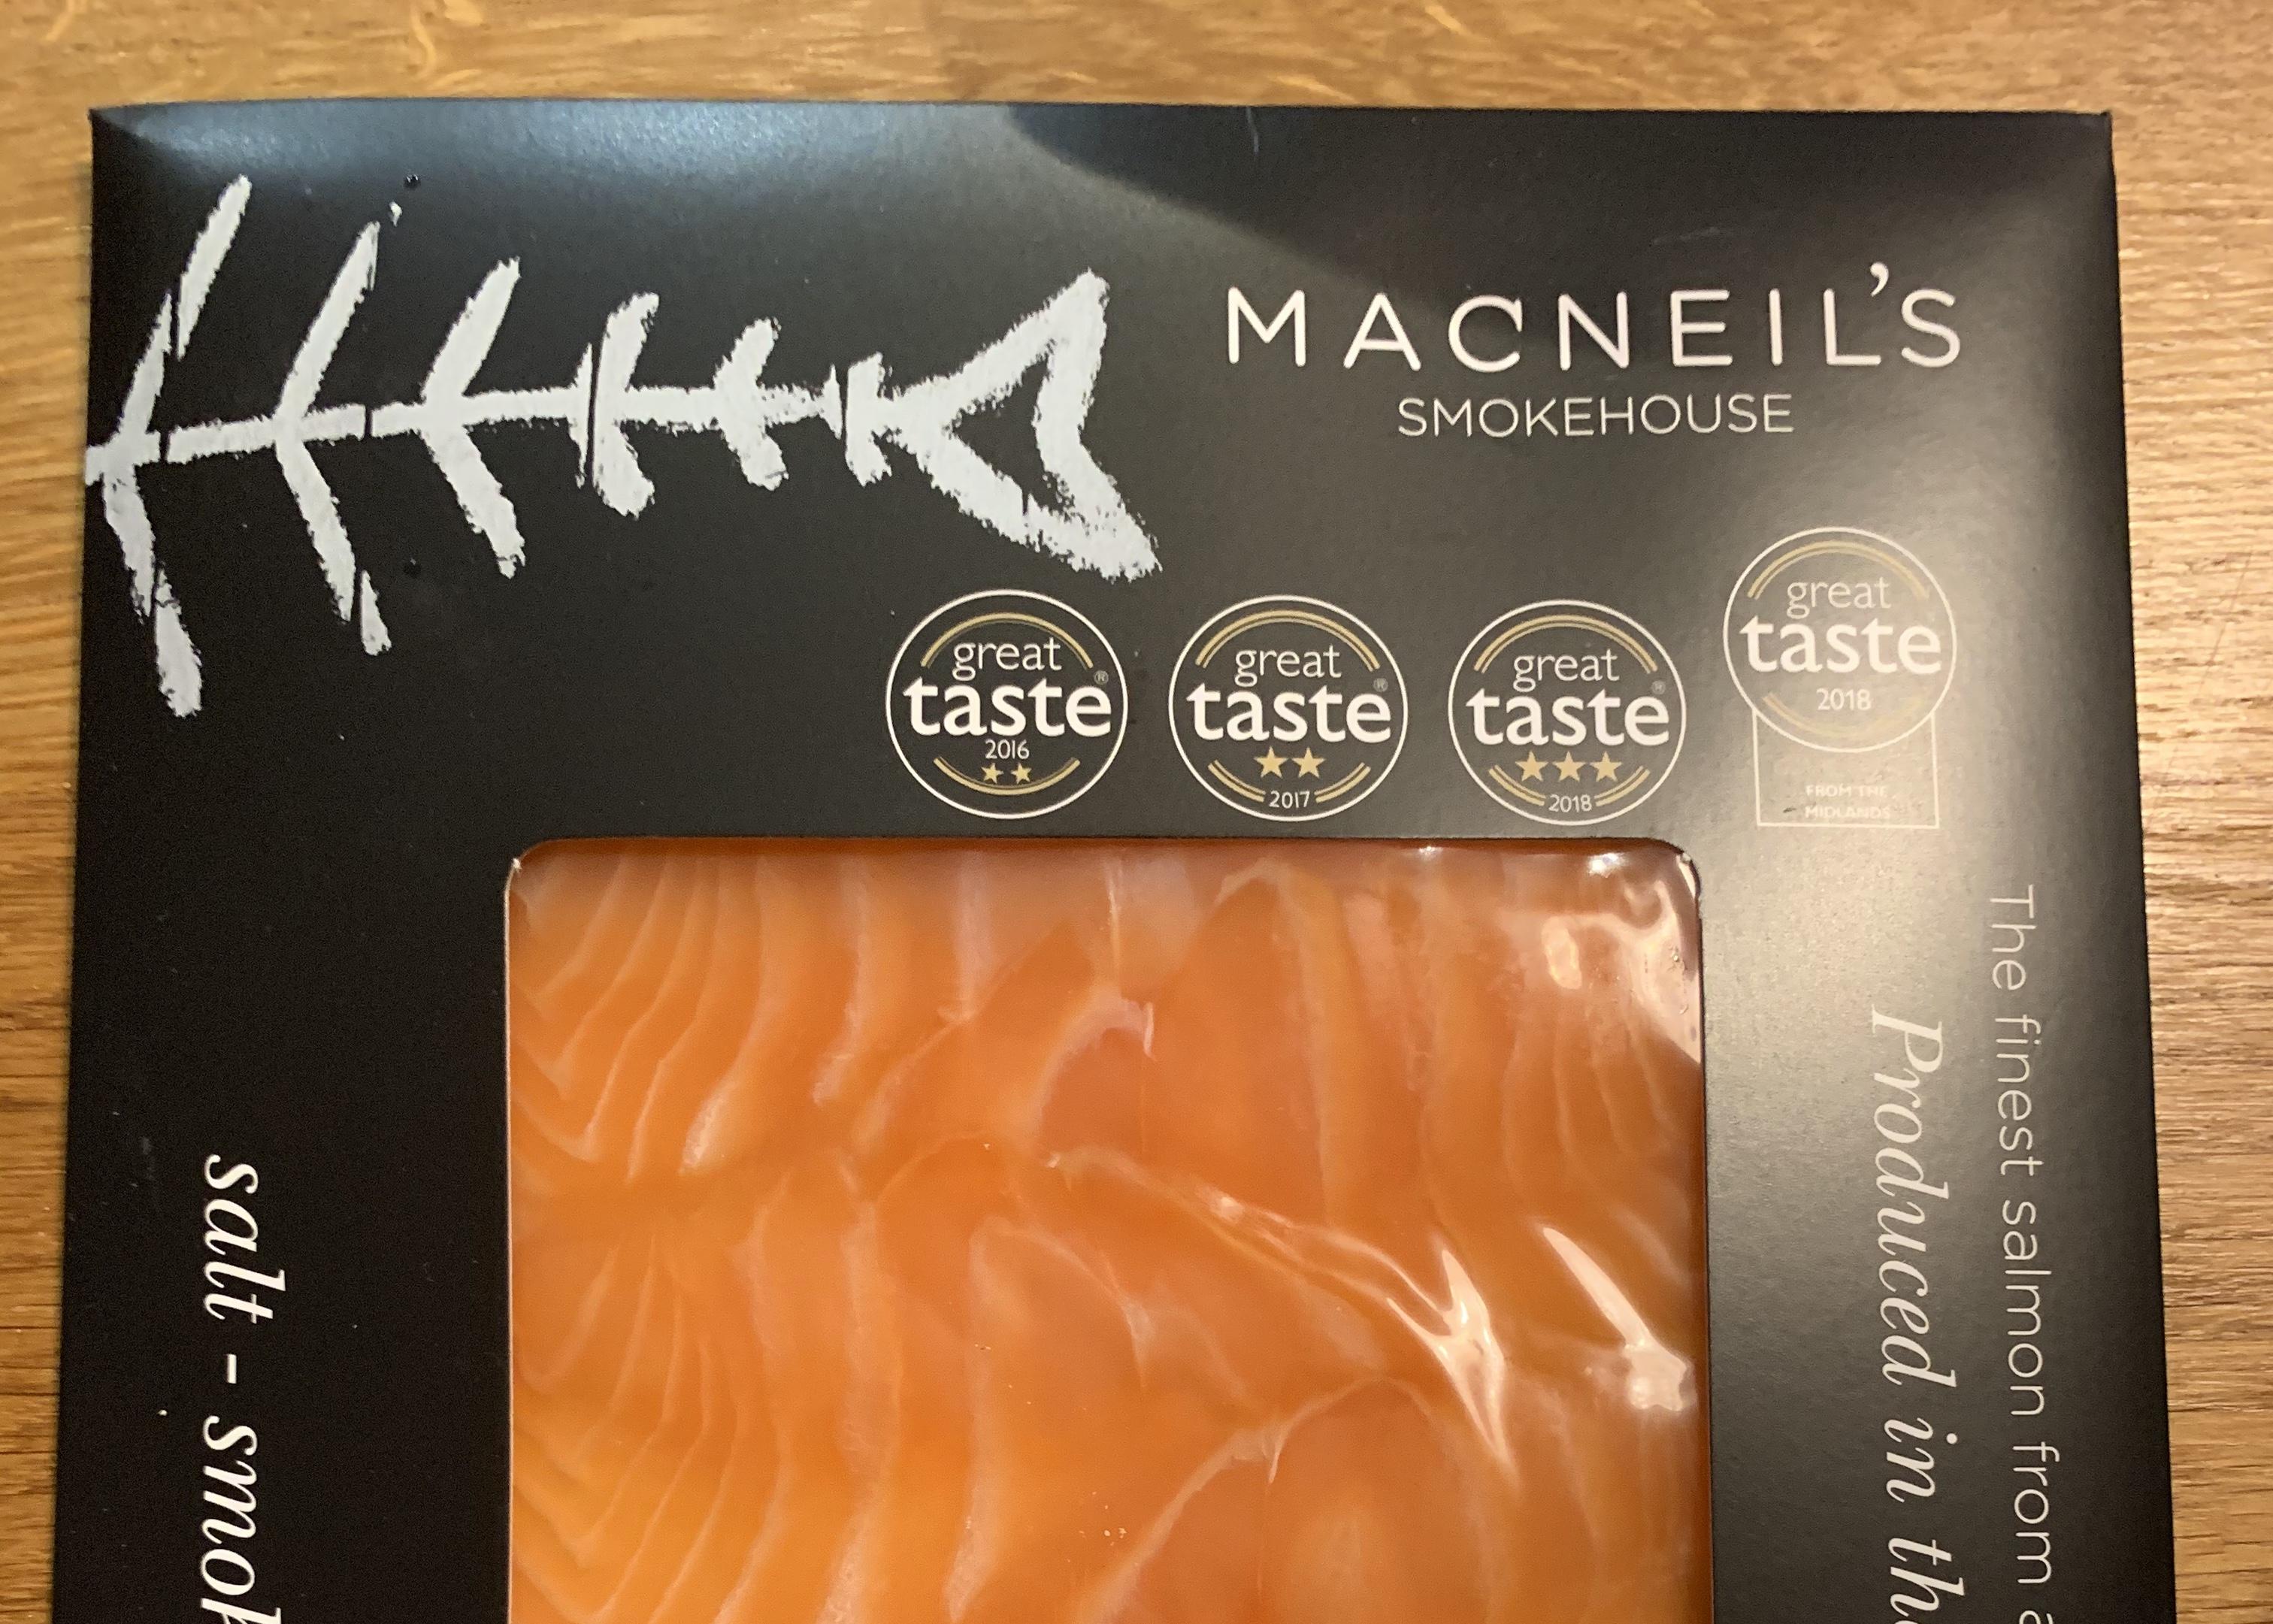 Macneil's Smokehouse - Smoked Salmon